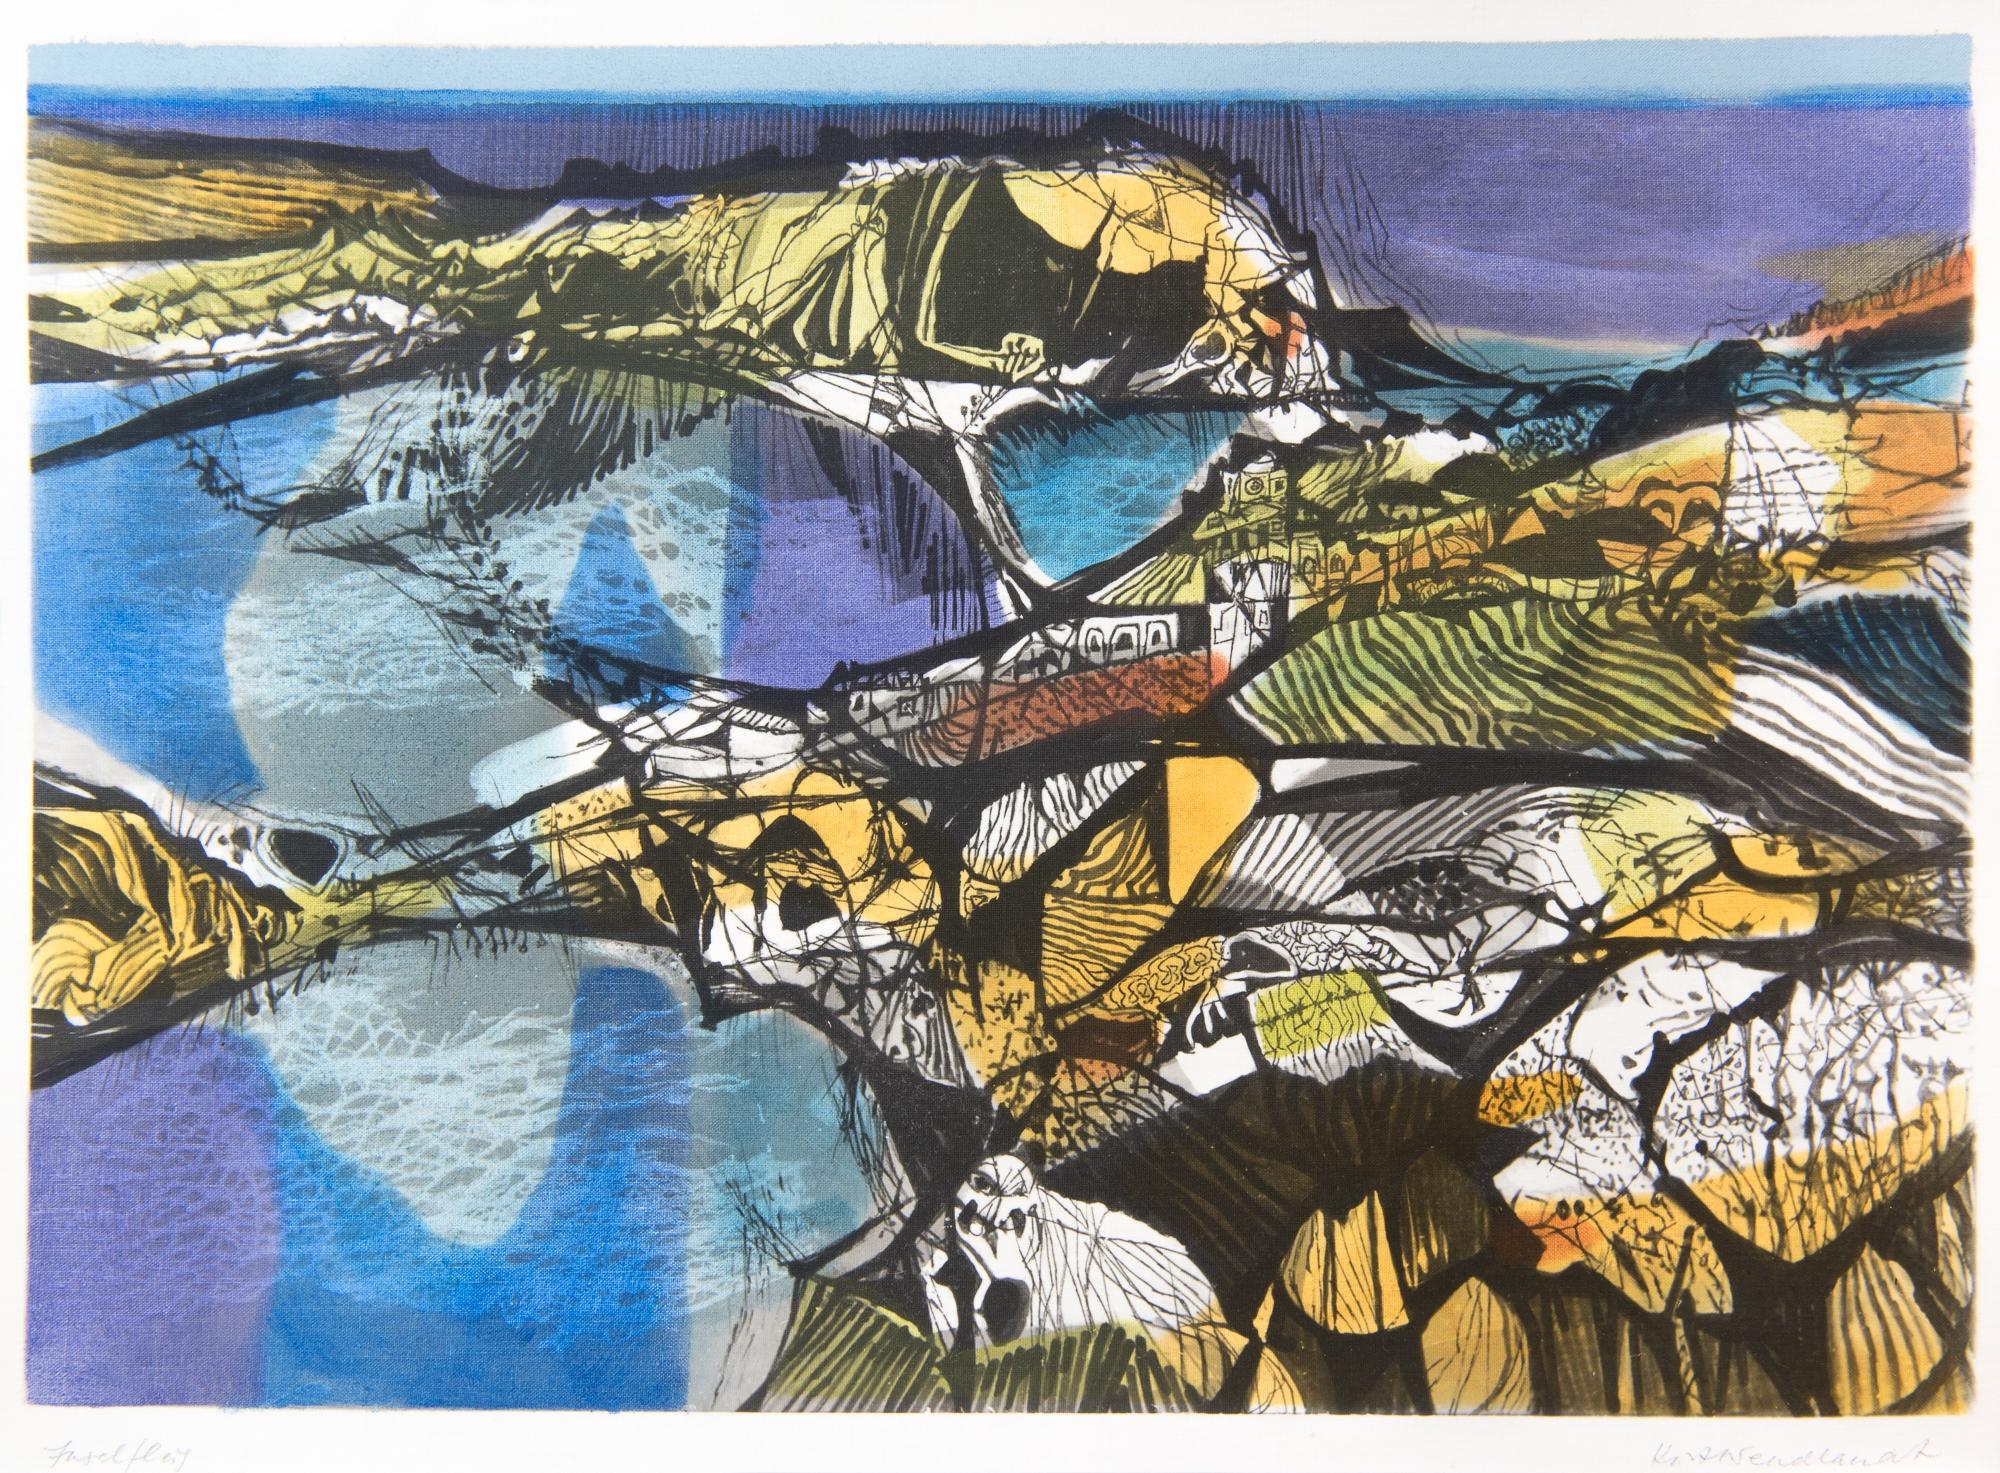 Inselflug by Kurt Wendlandt